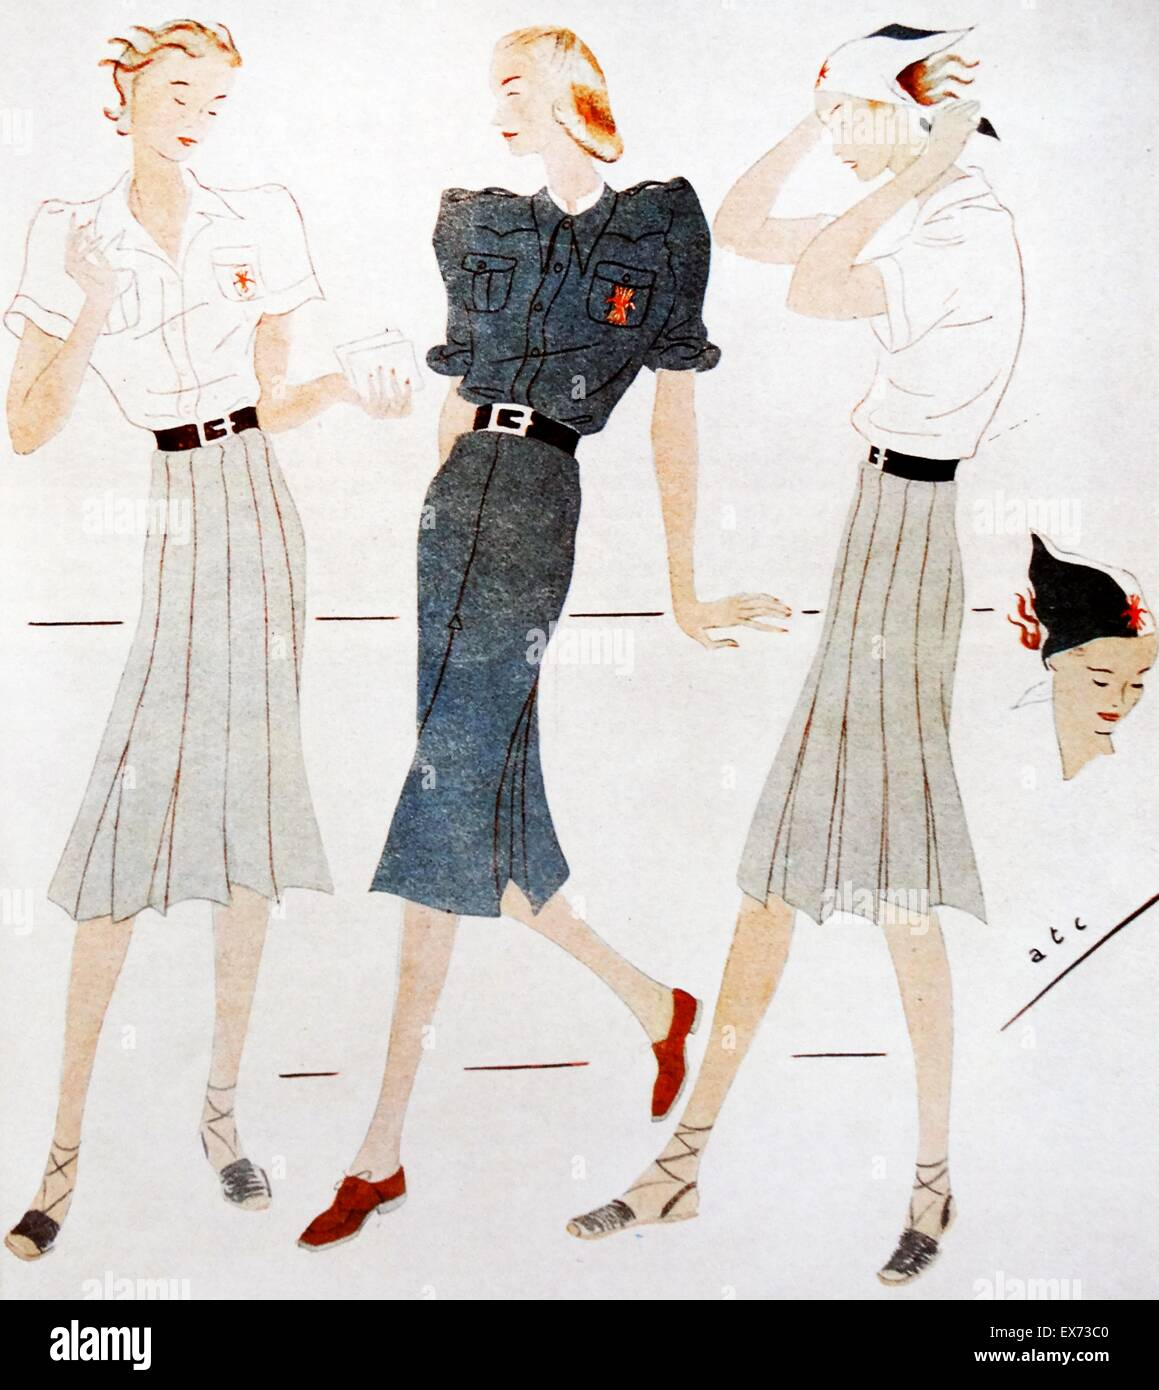 Falangist women's organisation uniforms during the Spanish Civil War - Stock Image